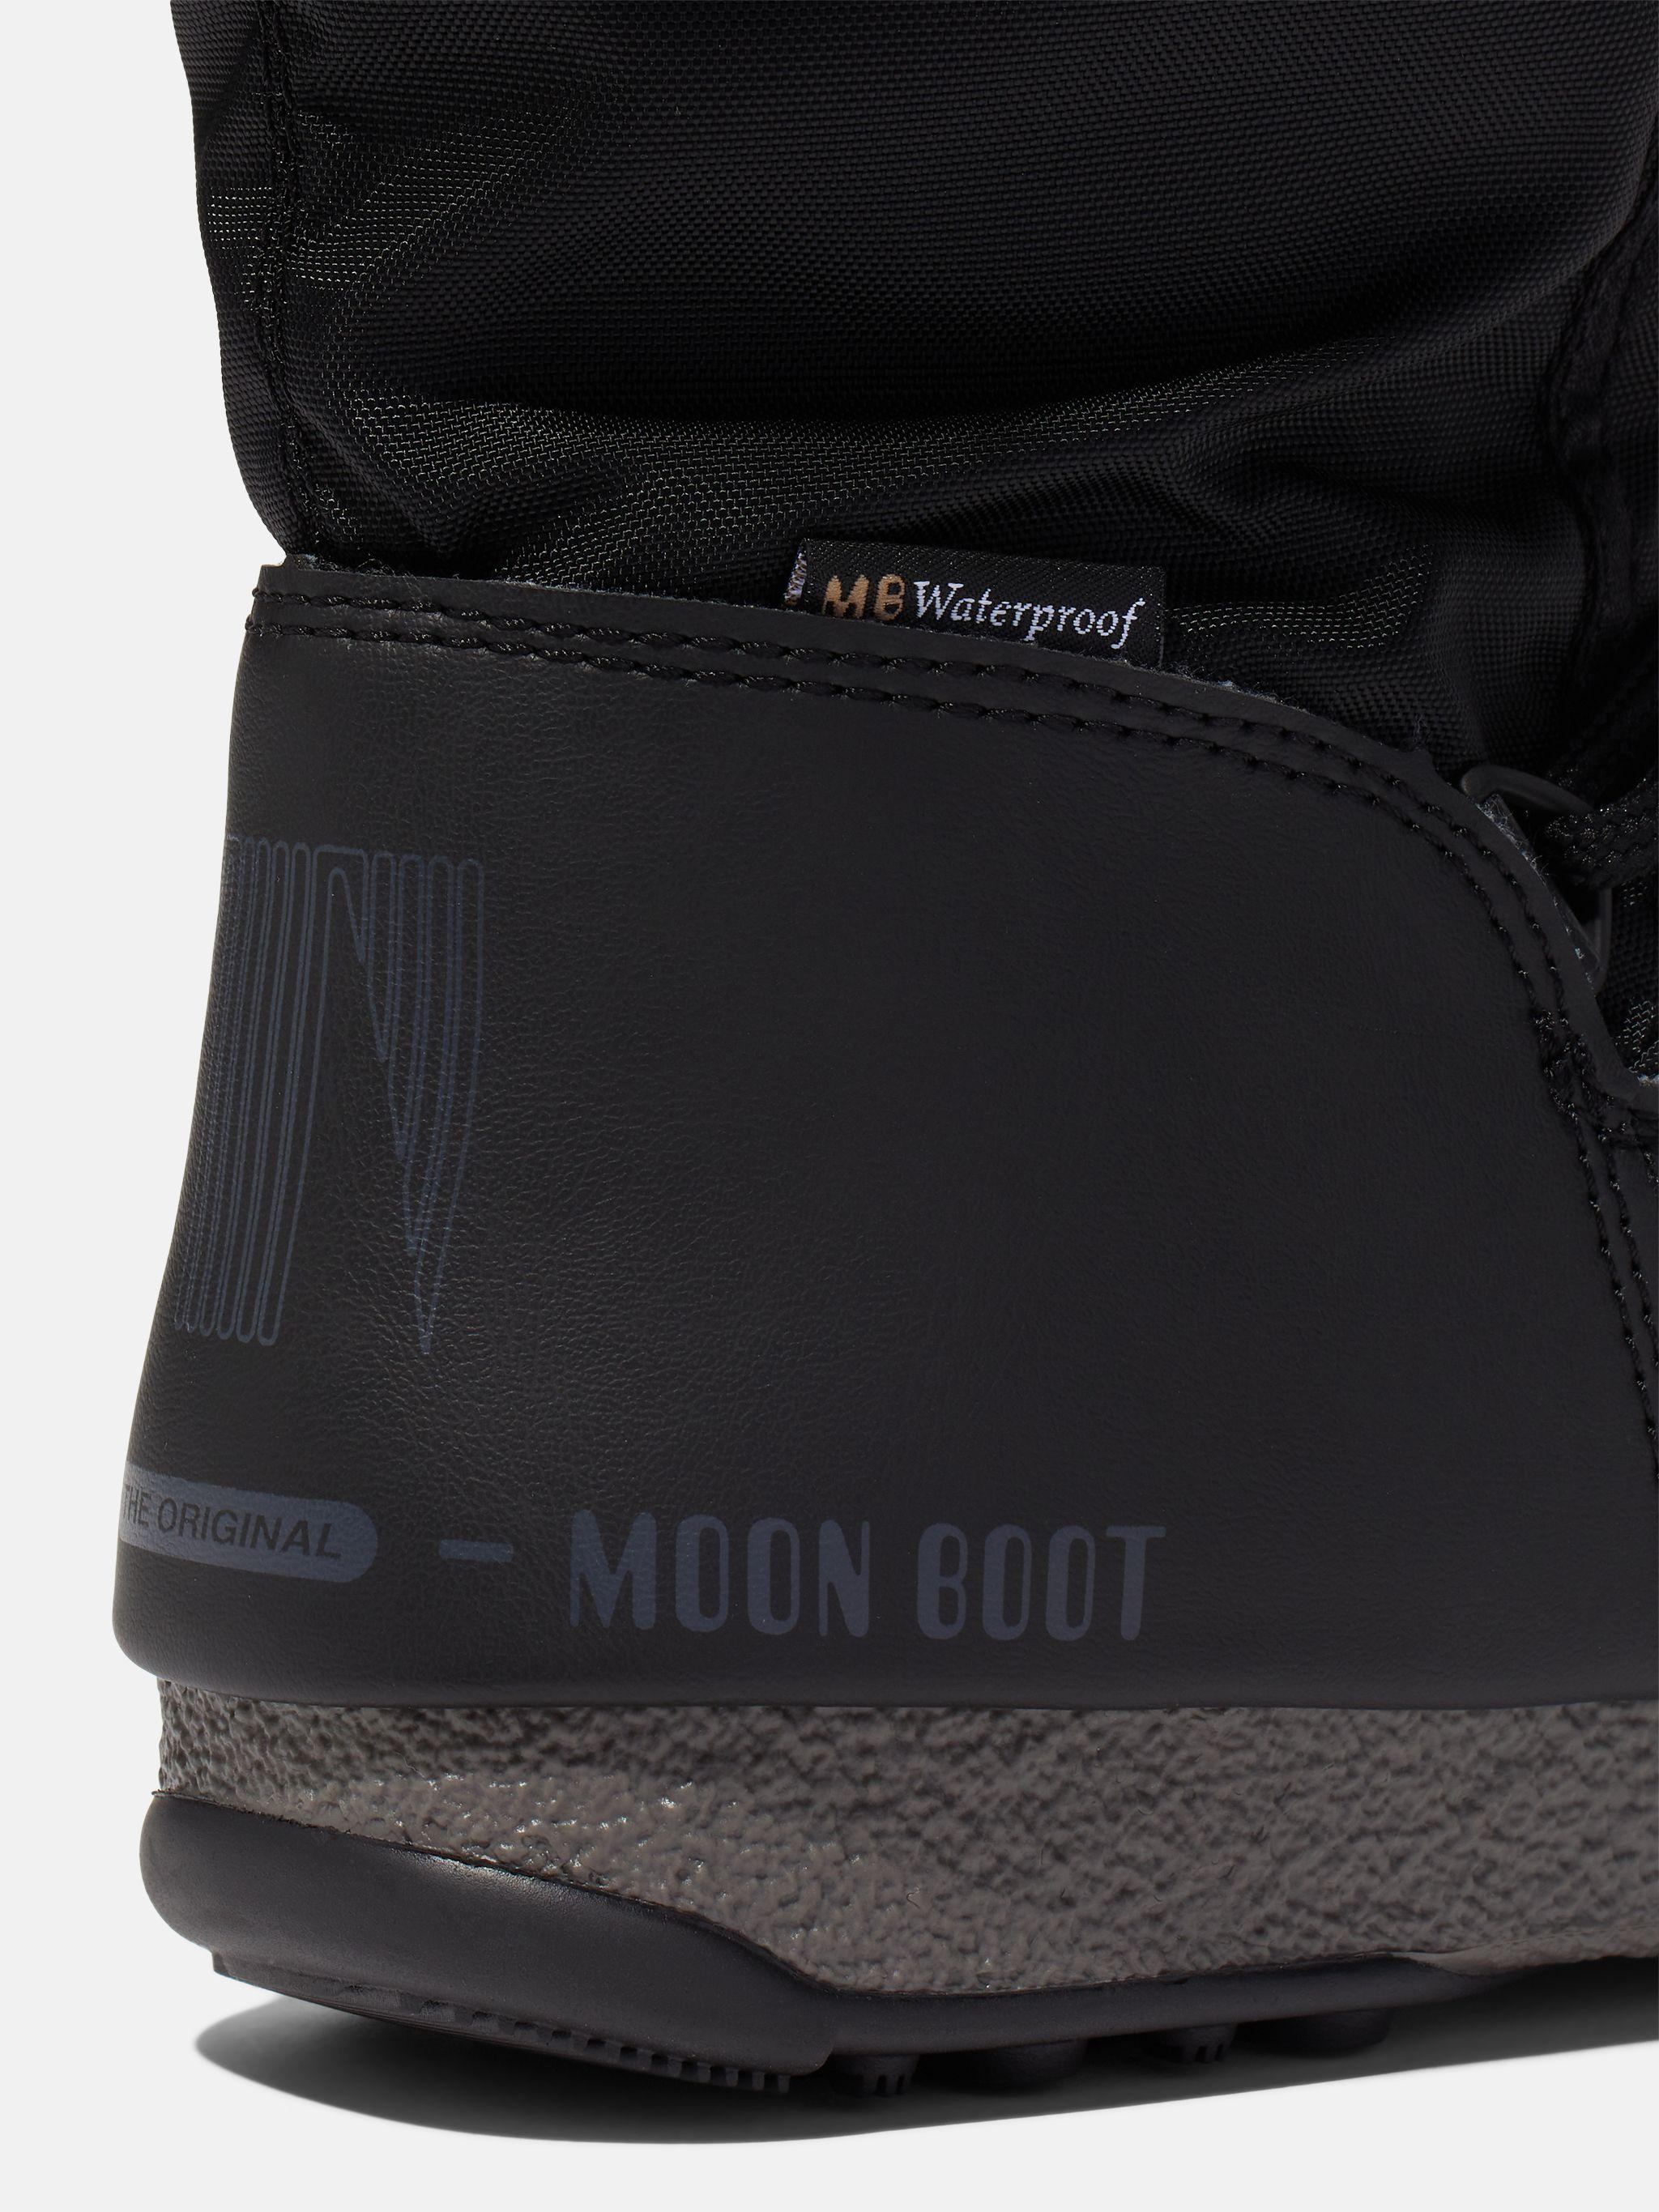 PROTECHT HI-TOP MONACO BLACK BOOTS